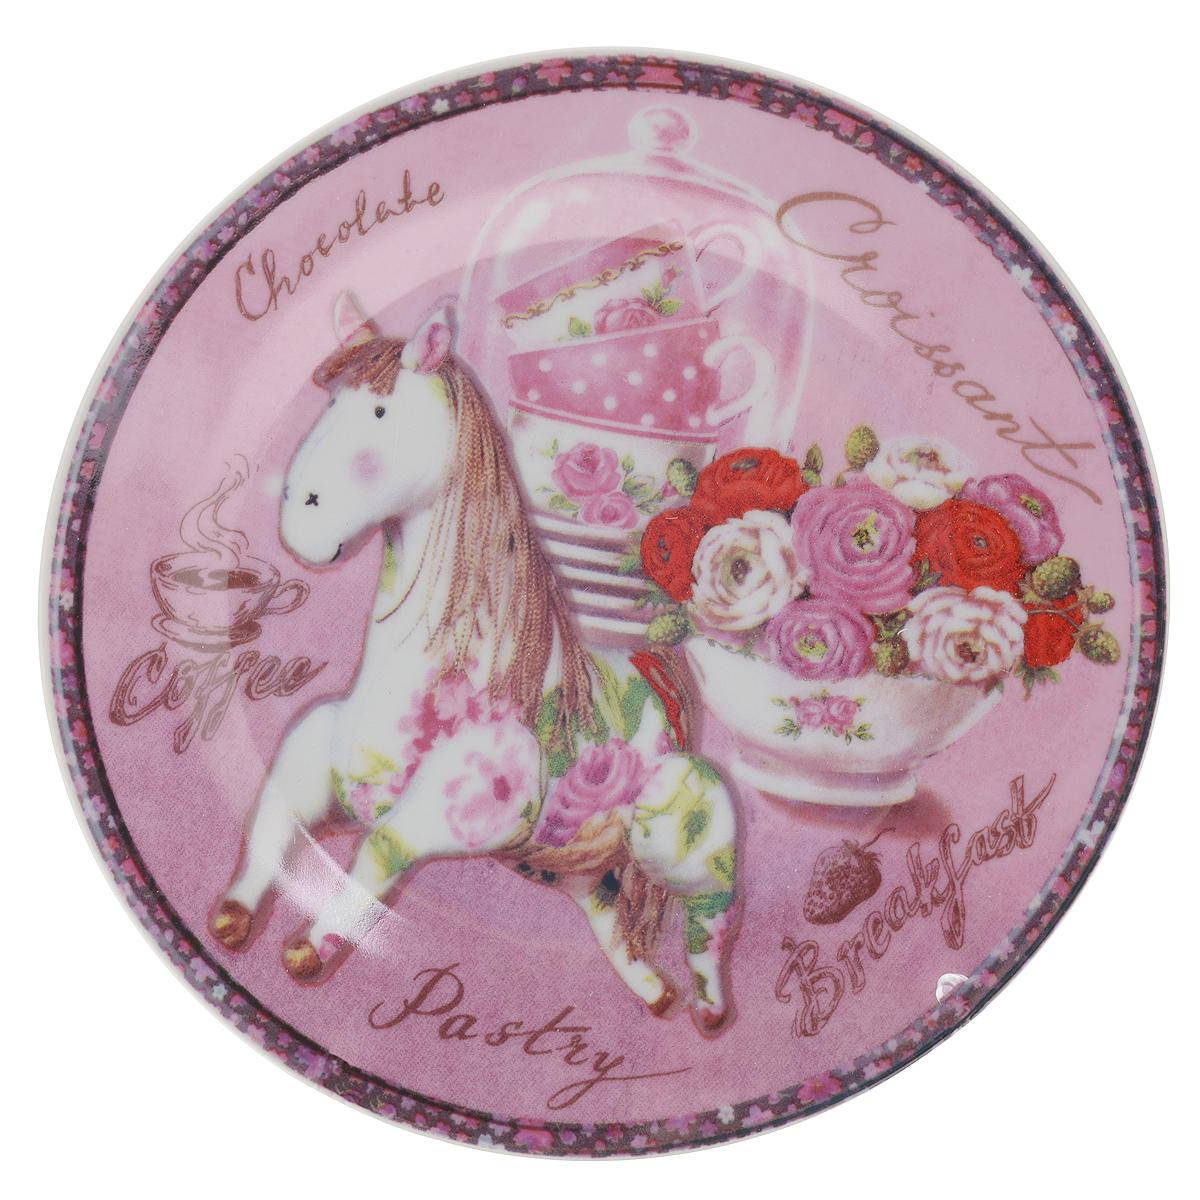 Тарелка декоративная Besko Винтажная лошадка, диаметр 18 см